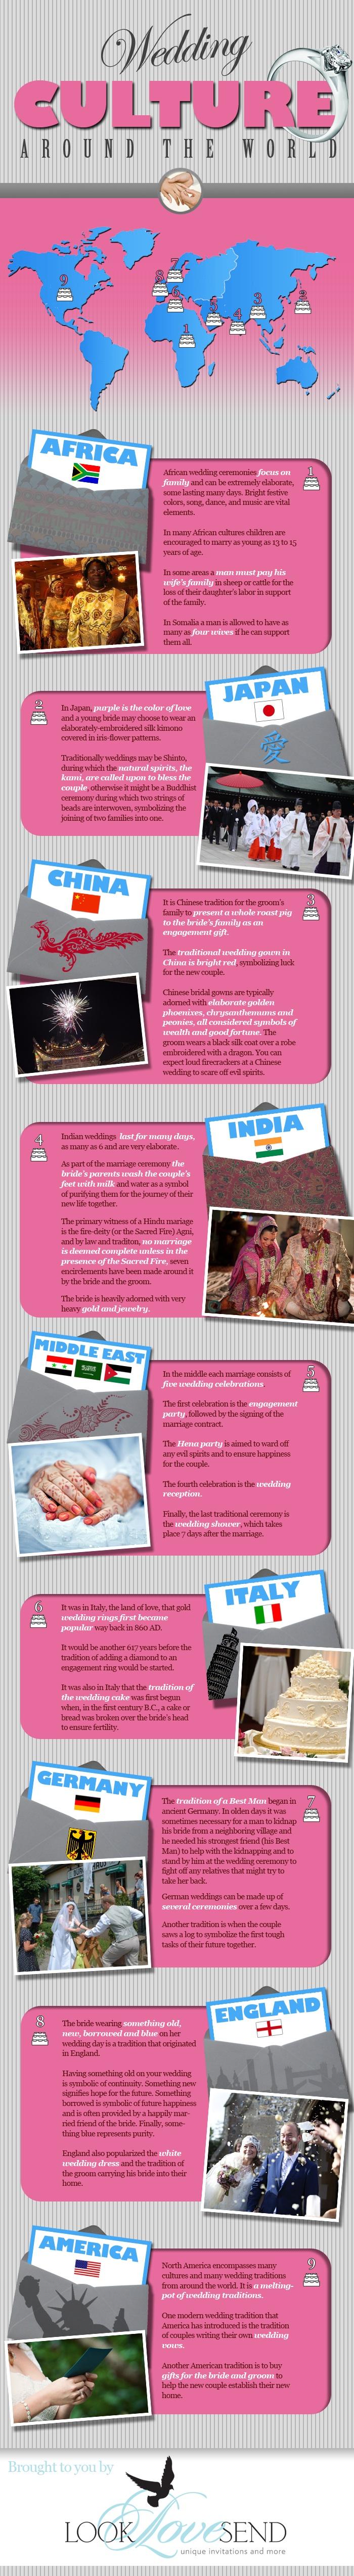 Wedding culture around the world from looklovesend